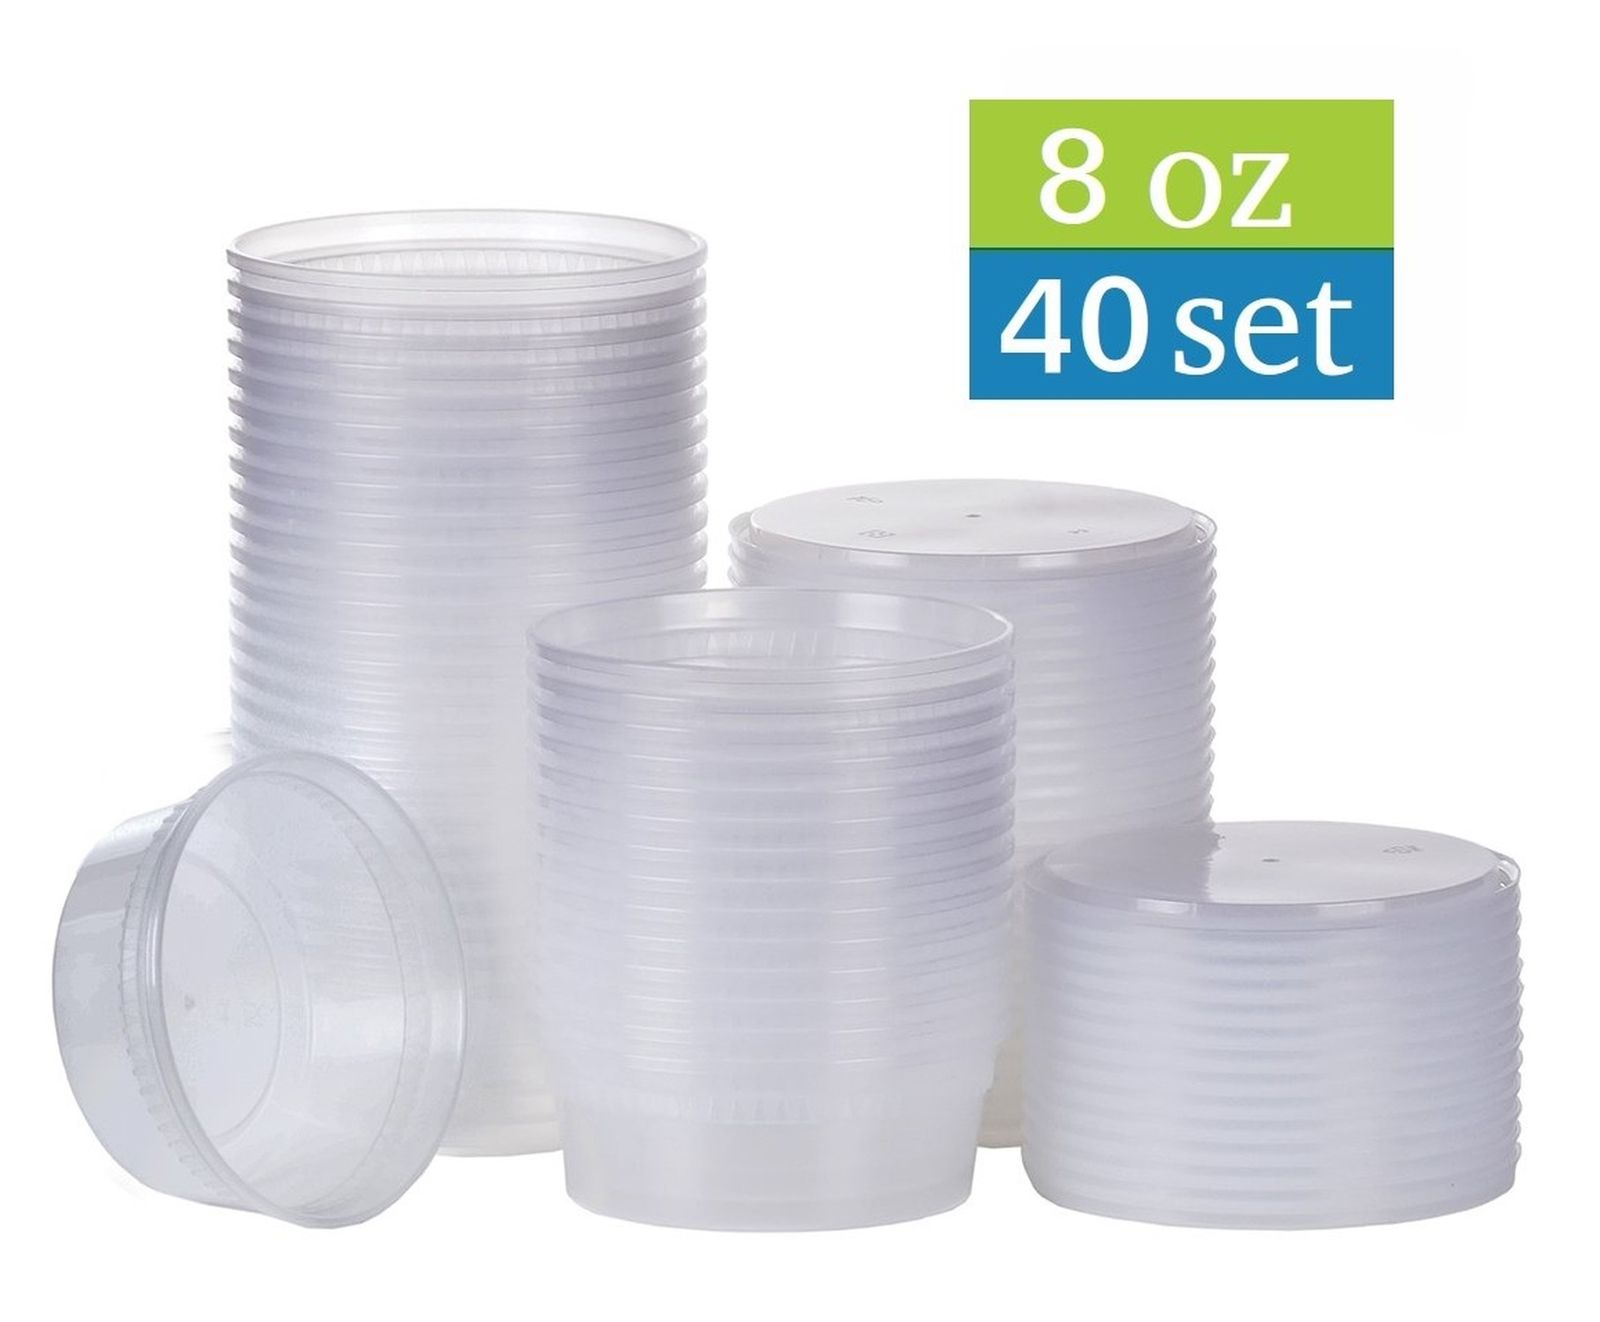 [TashiBox] 8 oz plastic food storage containers with lids - 40 sets , New 1